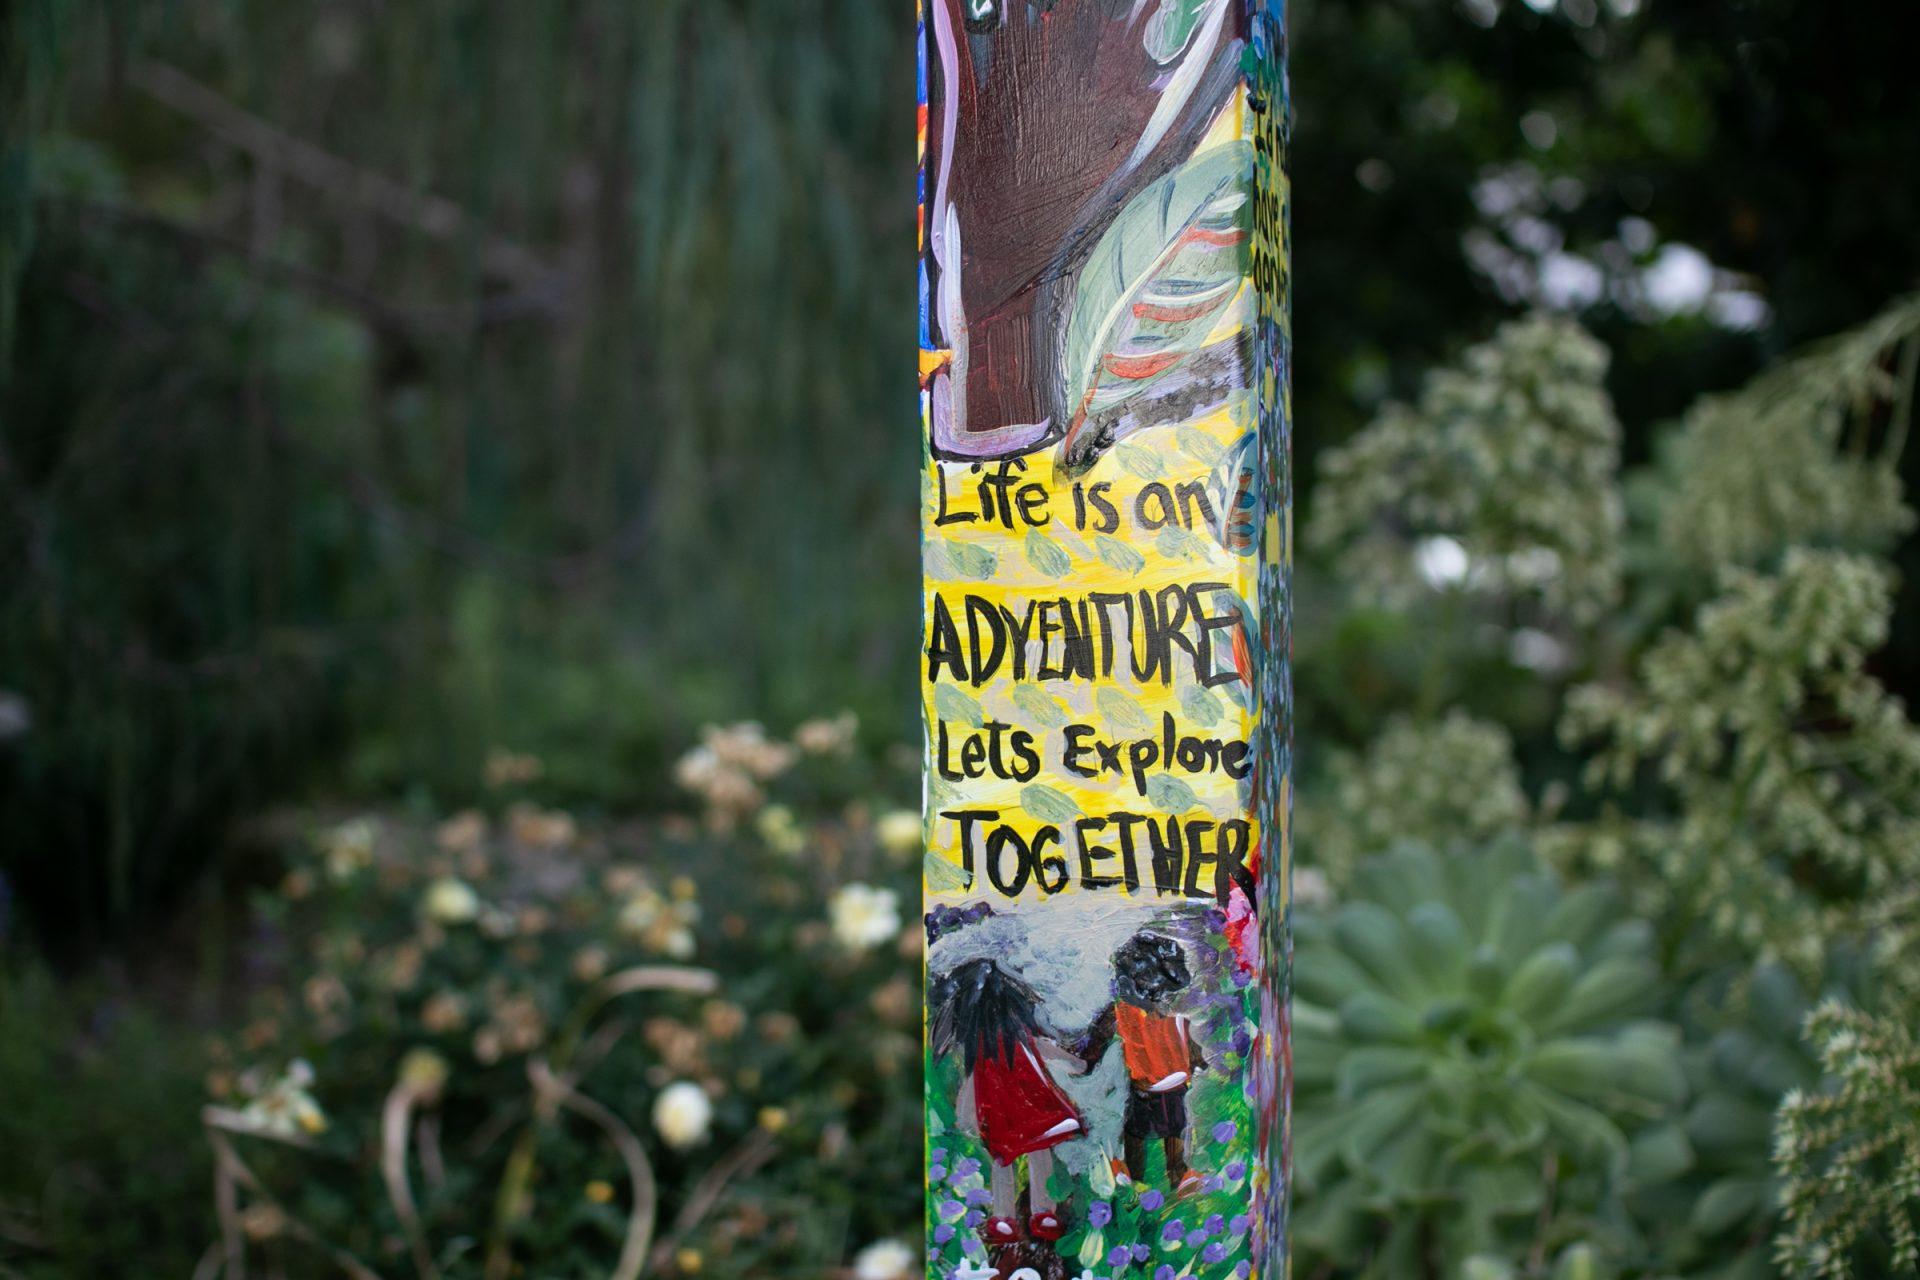 Small Graffiti On Street Pole